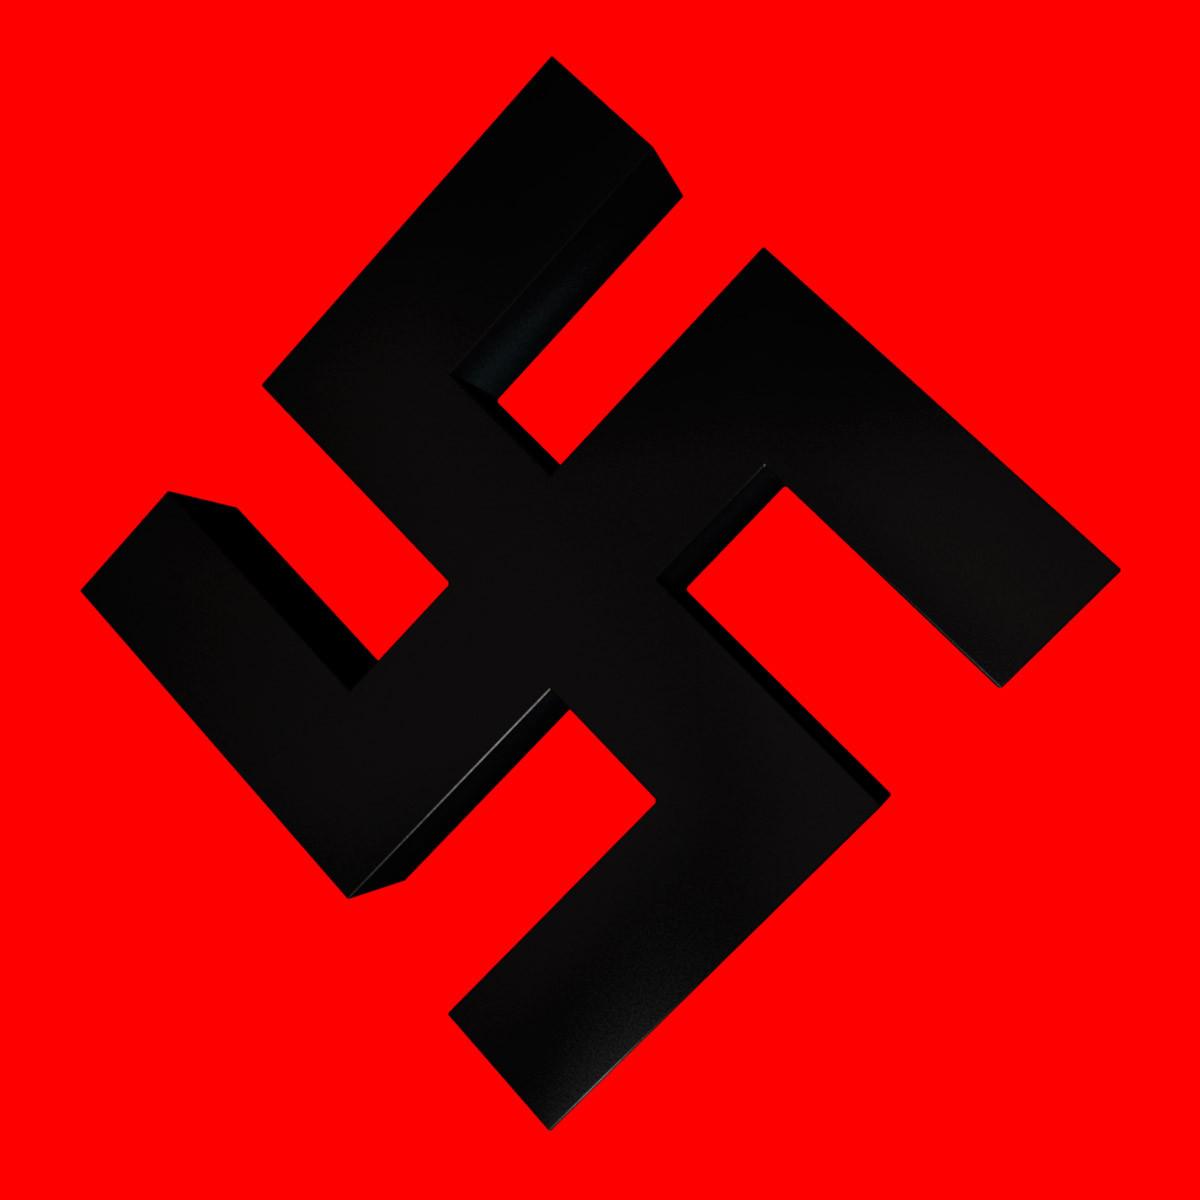 an examination of the nazi symbol swastika Design company is slammed for creating a nazi symbol fashion range featuring a rainbow swastika 'representing peace and love' ka design said 'swastika examination.